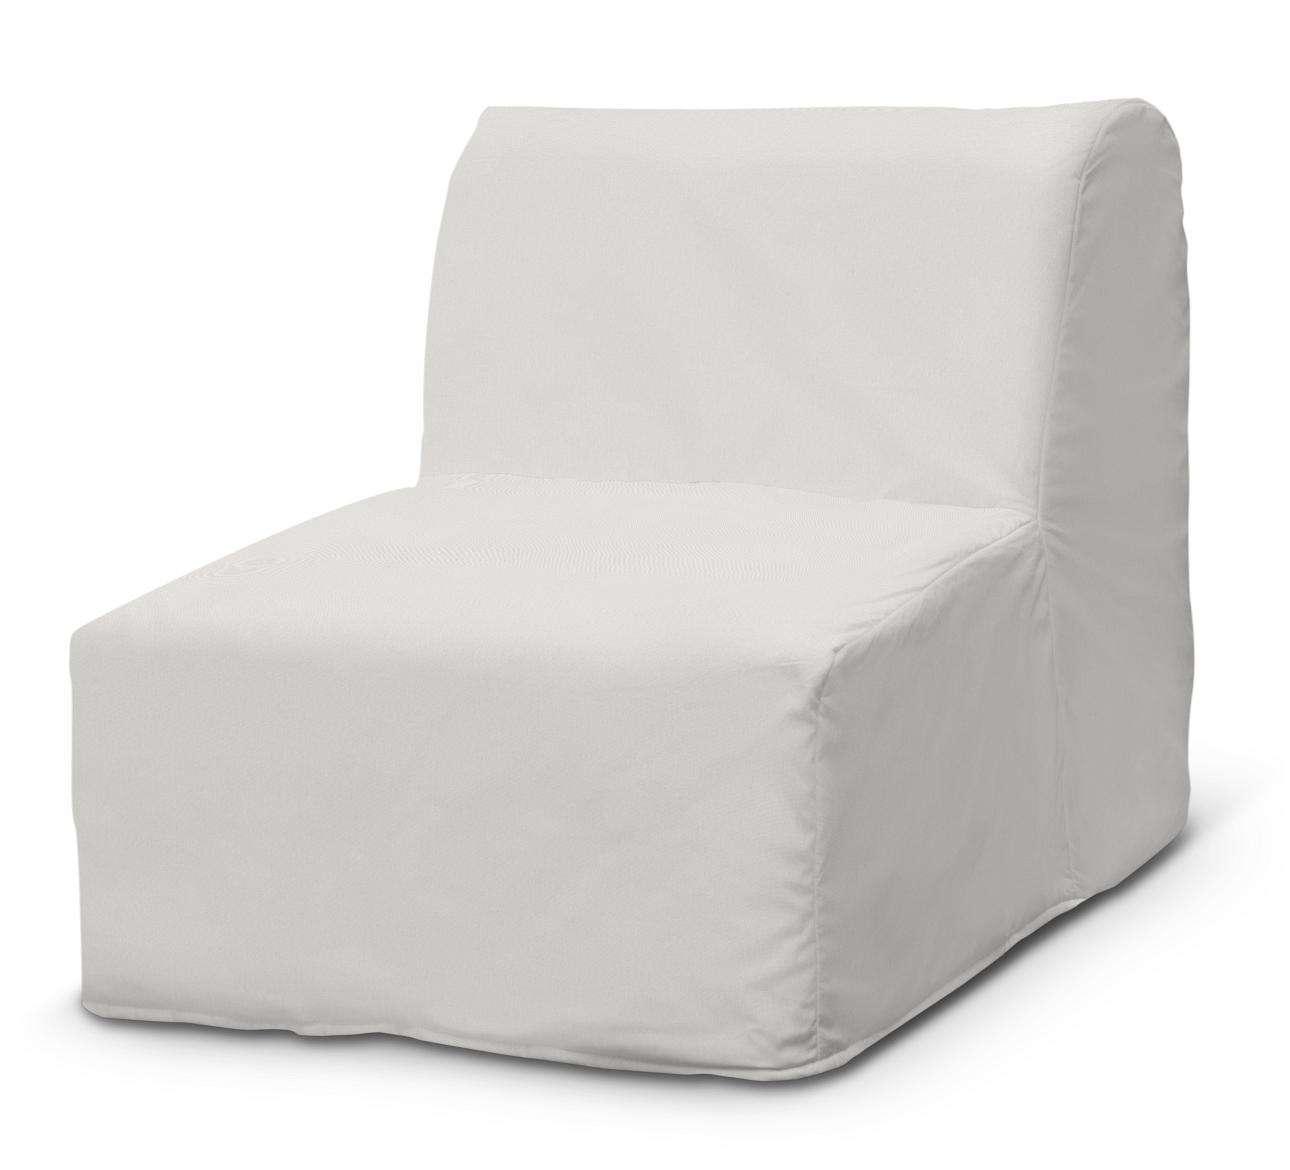 Pokrowiec na fotel Lycksele prosty fotel Lycksele w kolekcji Etna , tkanina: 705-01